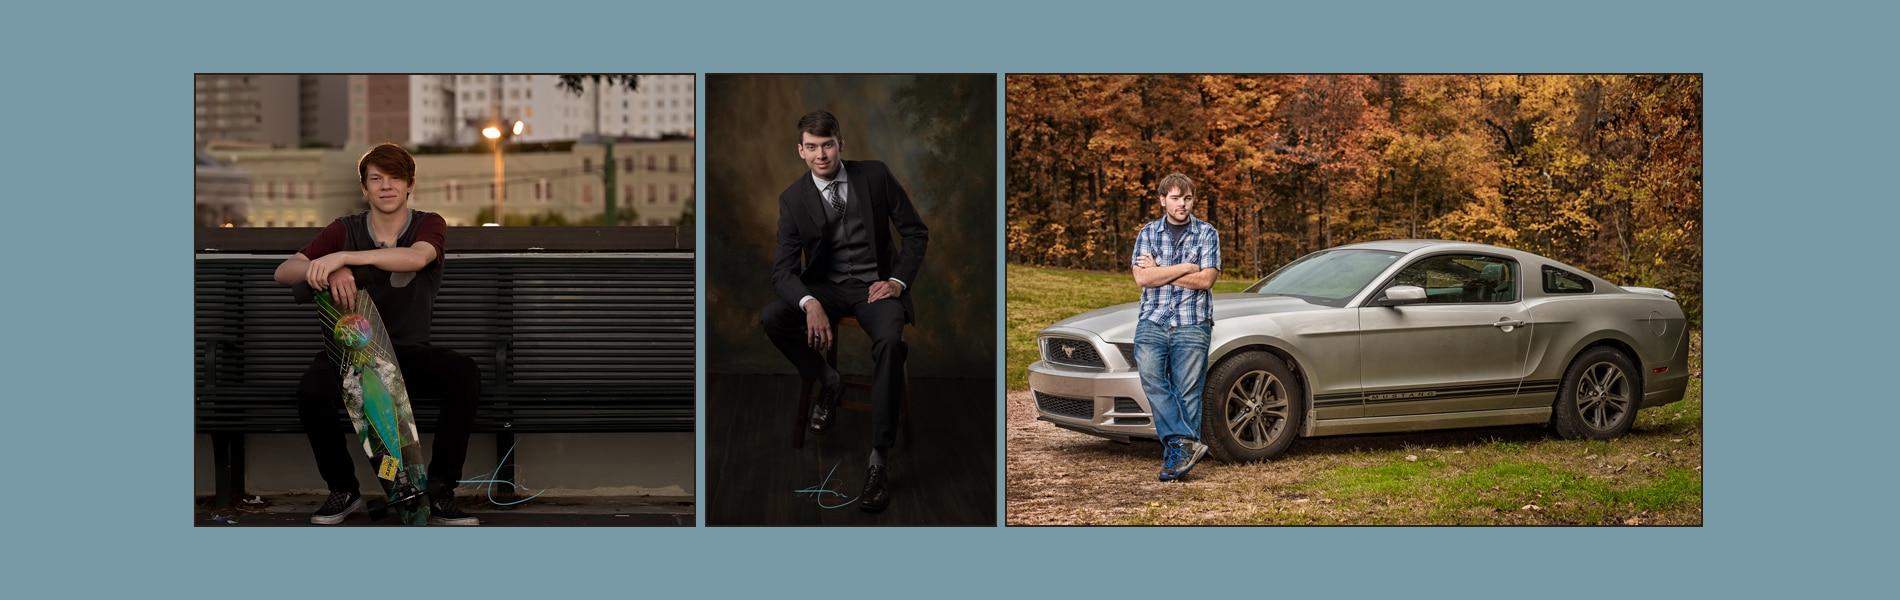 award winning senior portraits and headshots - front